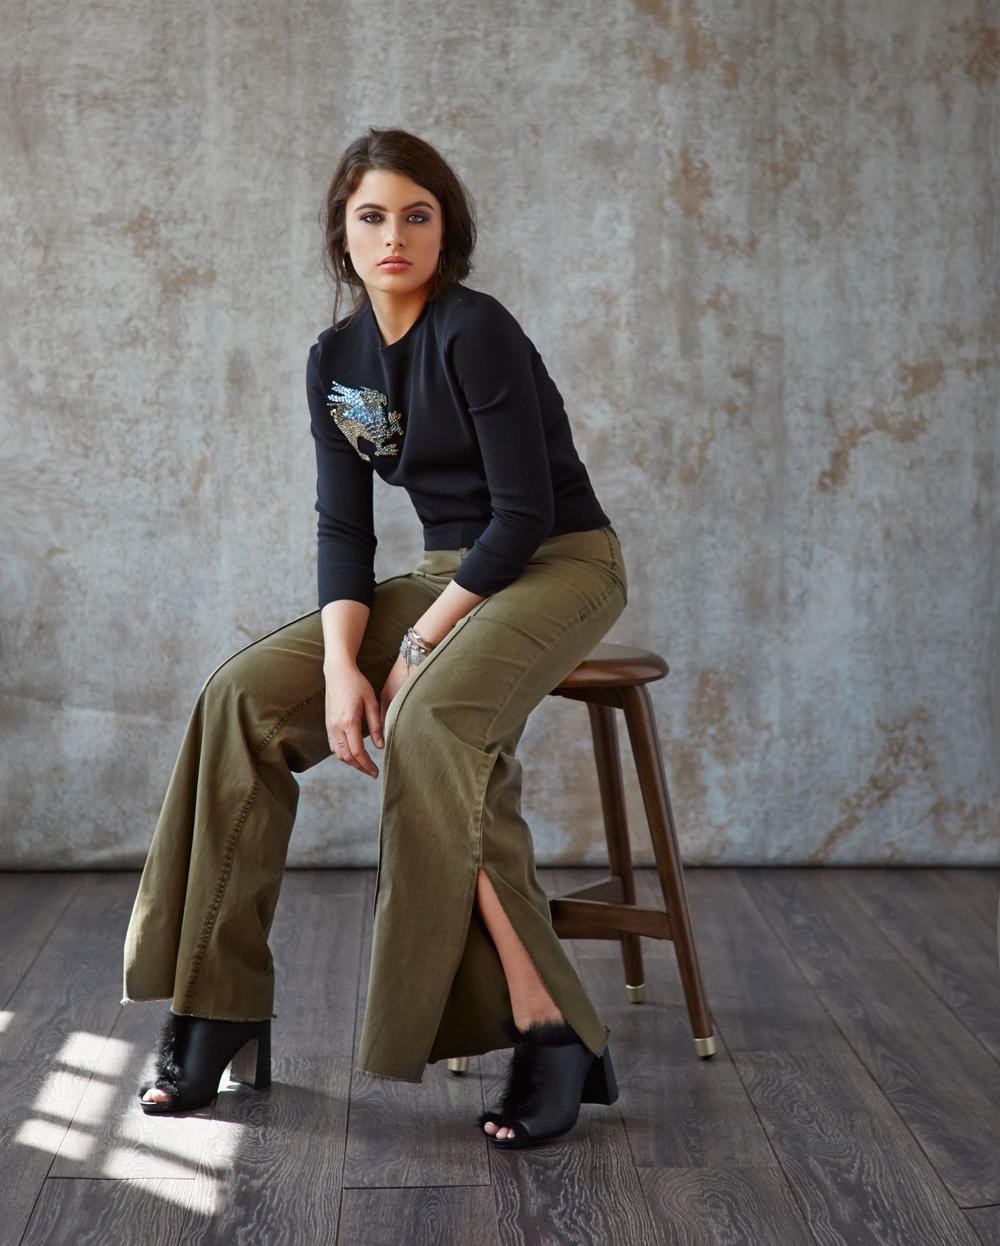 Alexander McQueen sweater, Cinq a Sept pants, Pedro Garcia fur-trim heels, Nan Fusco bracelets